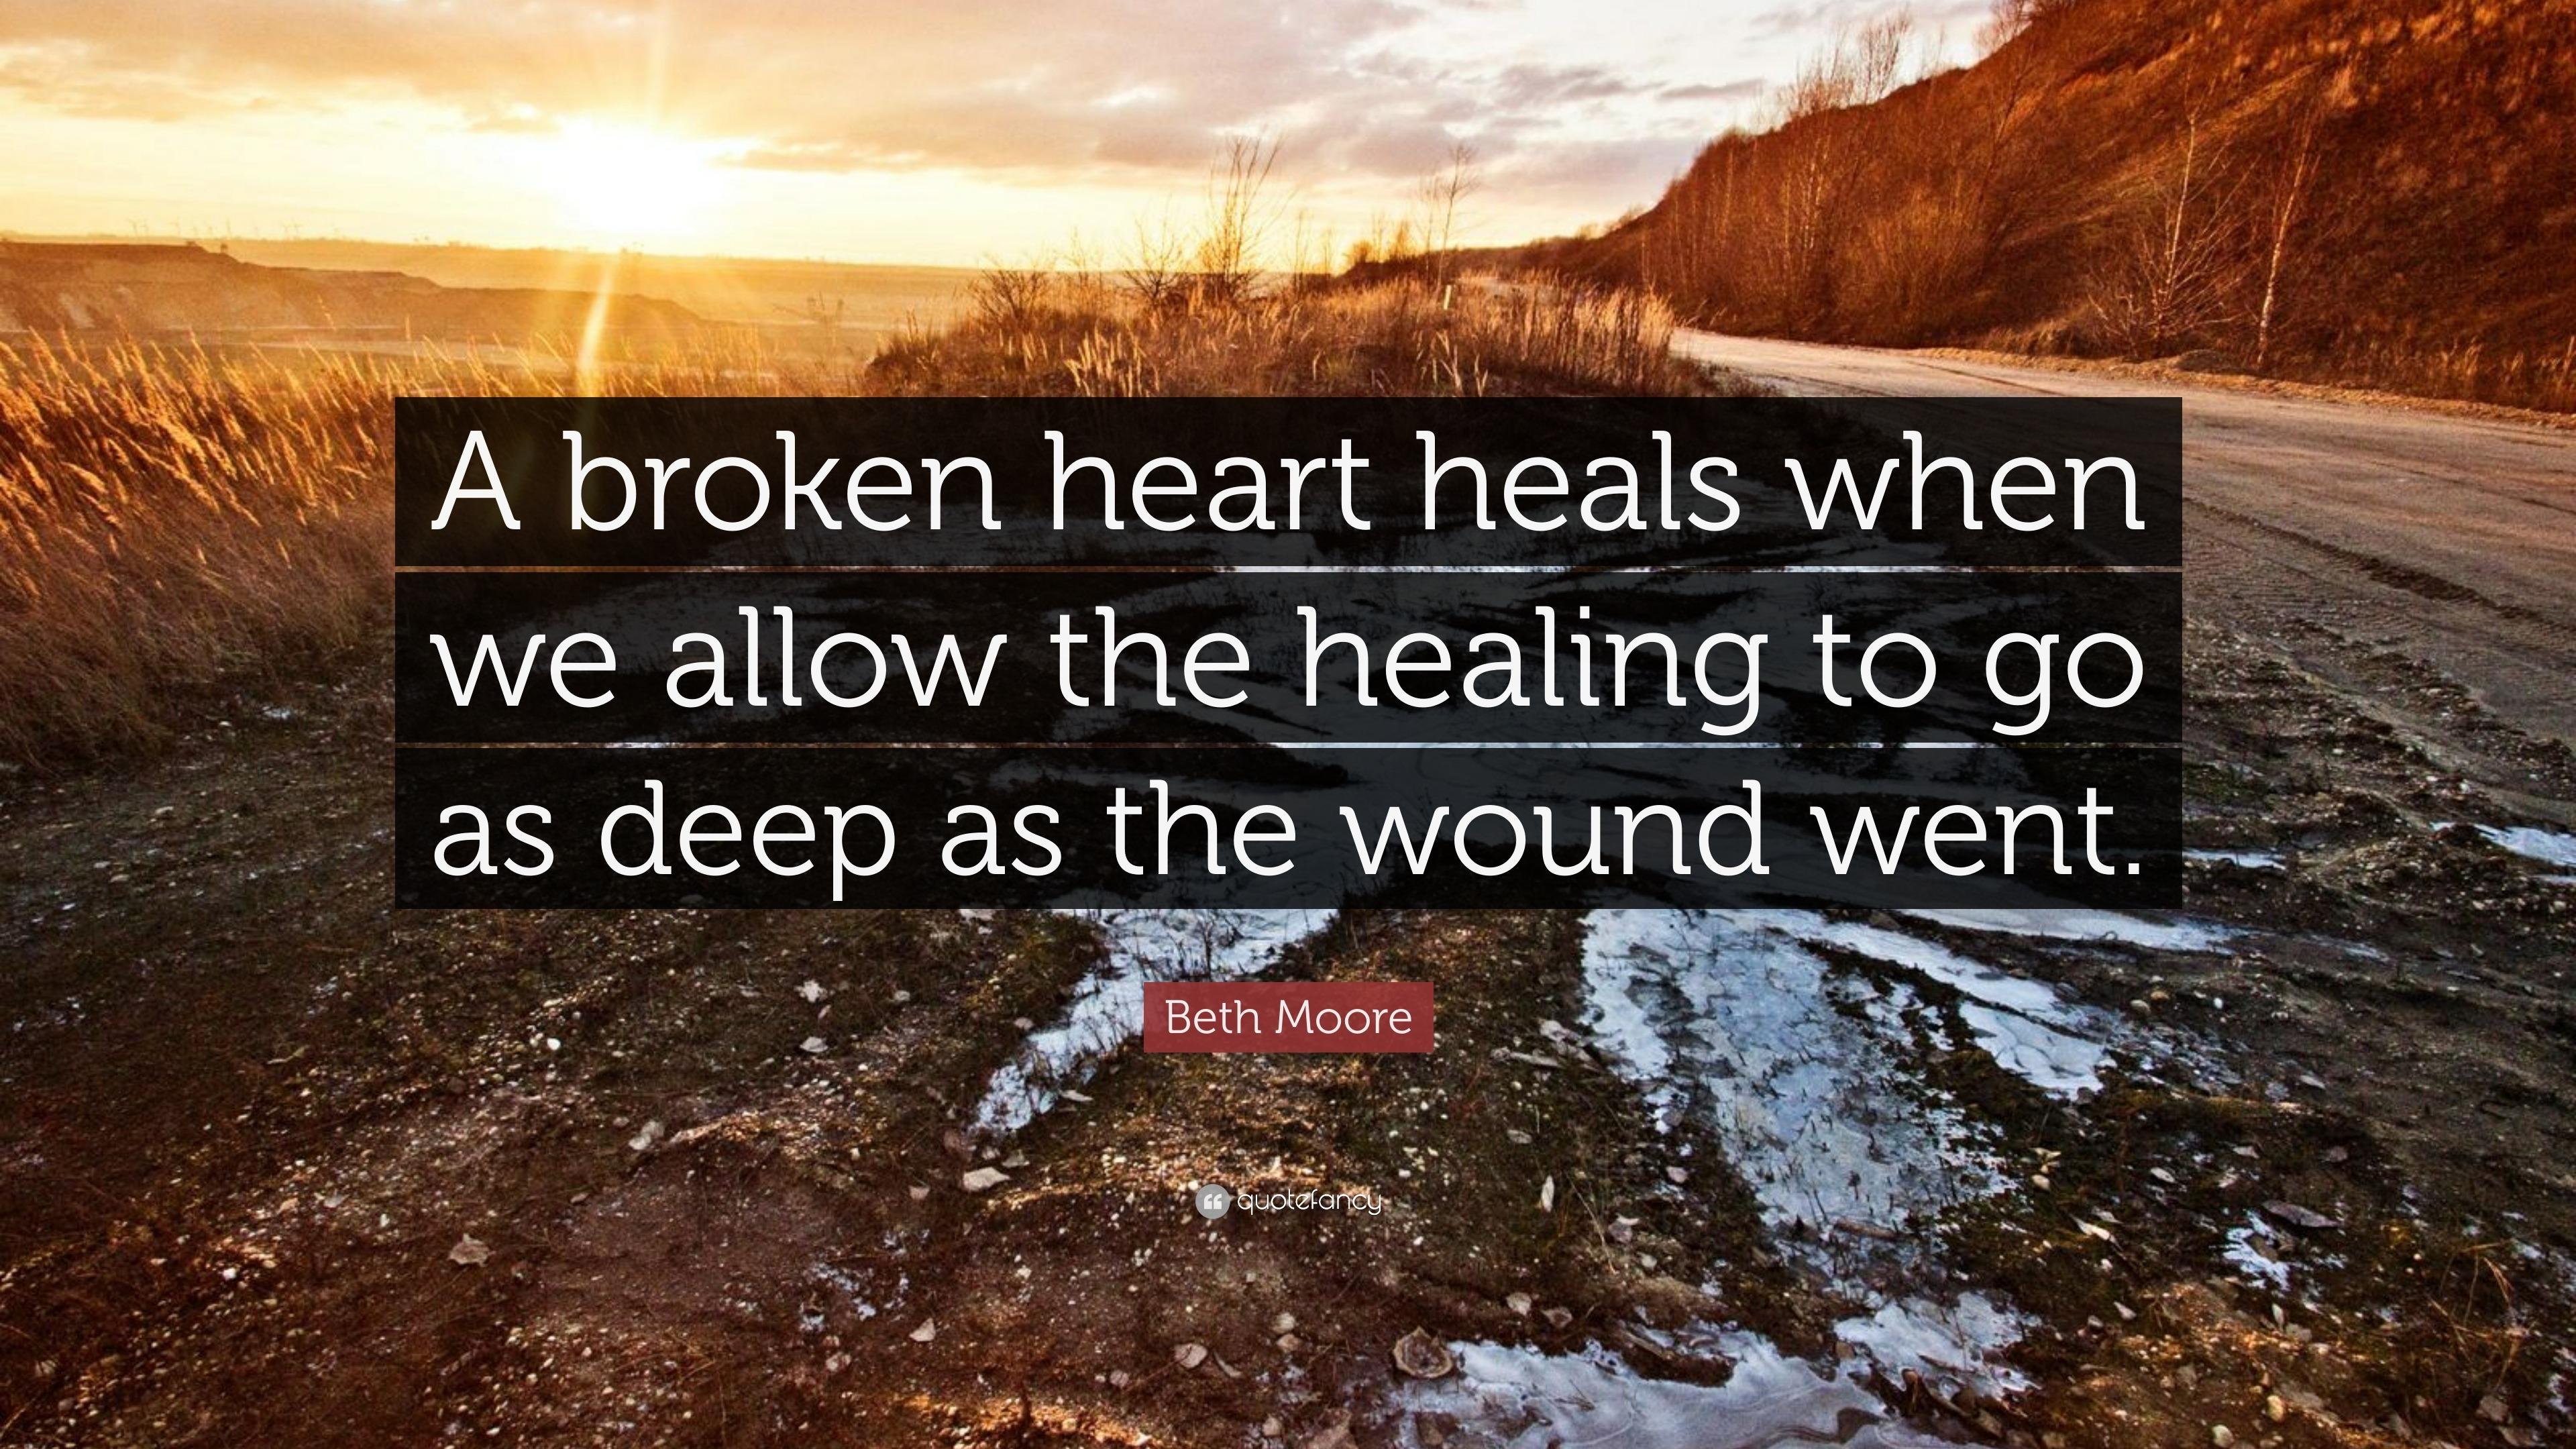 healing quotes quotefancy